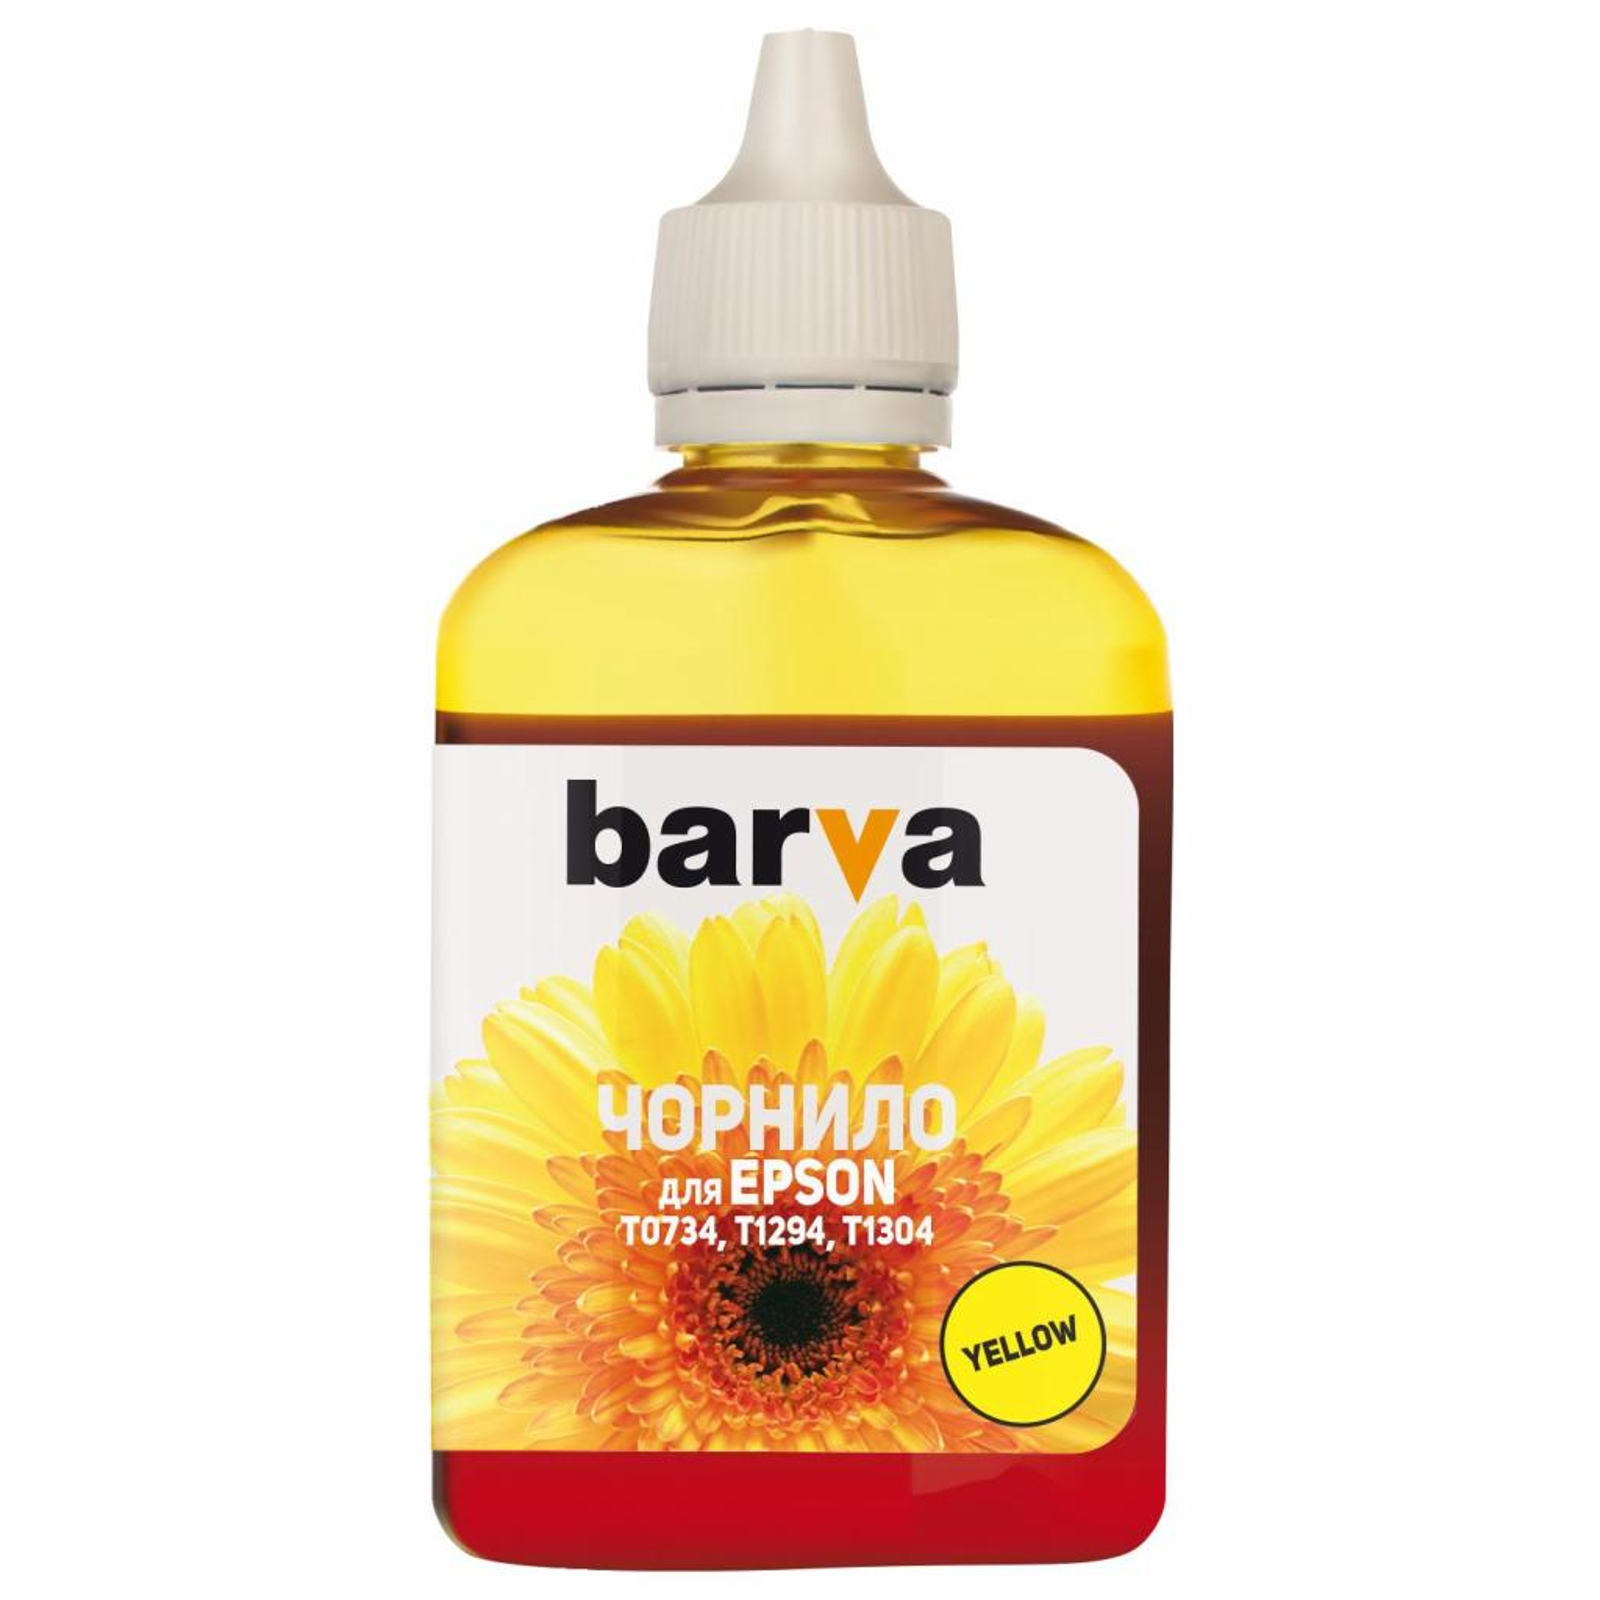 Чернила BARVA Epson T1304/T1294/T1284/T1034/T0734 Yellow 90 г pigm. (E130-530)